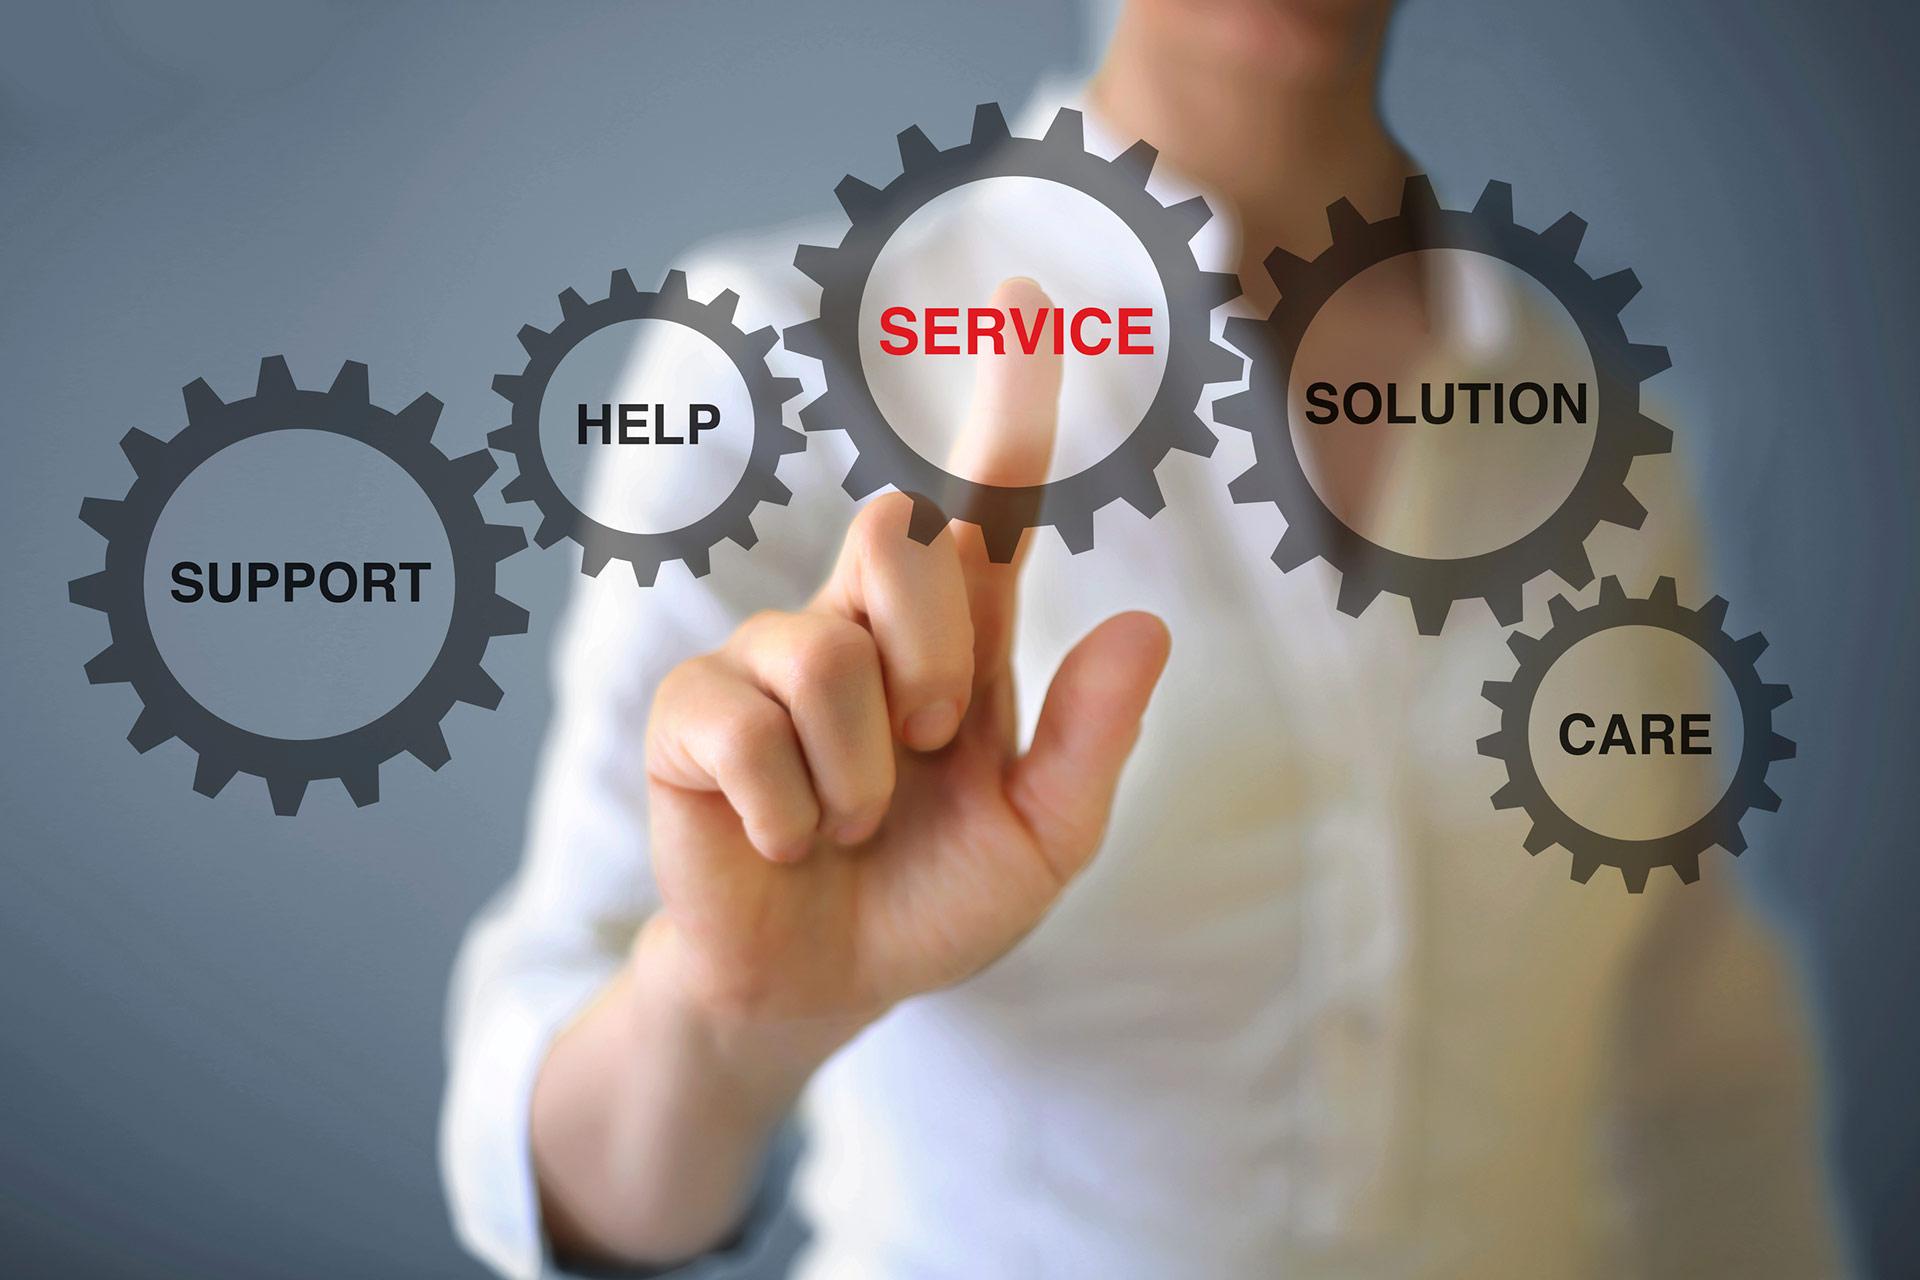 Вебинар: Инструменты разработки сервиса